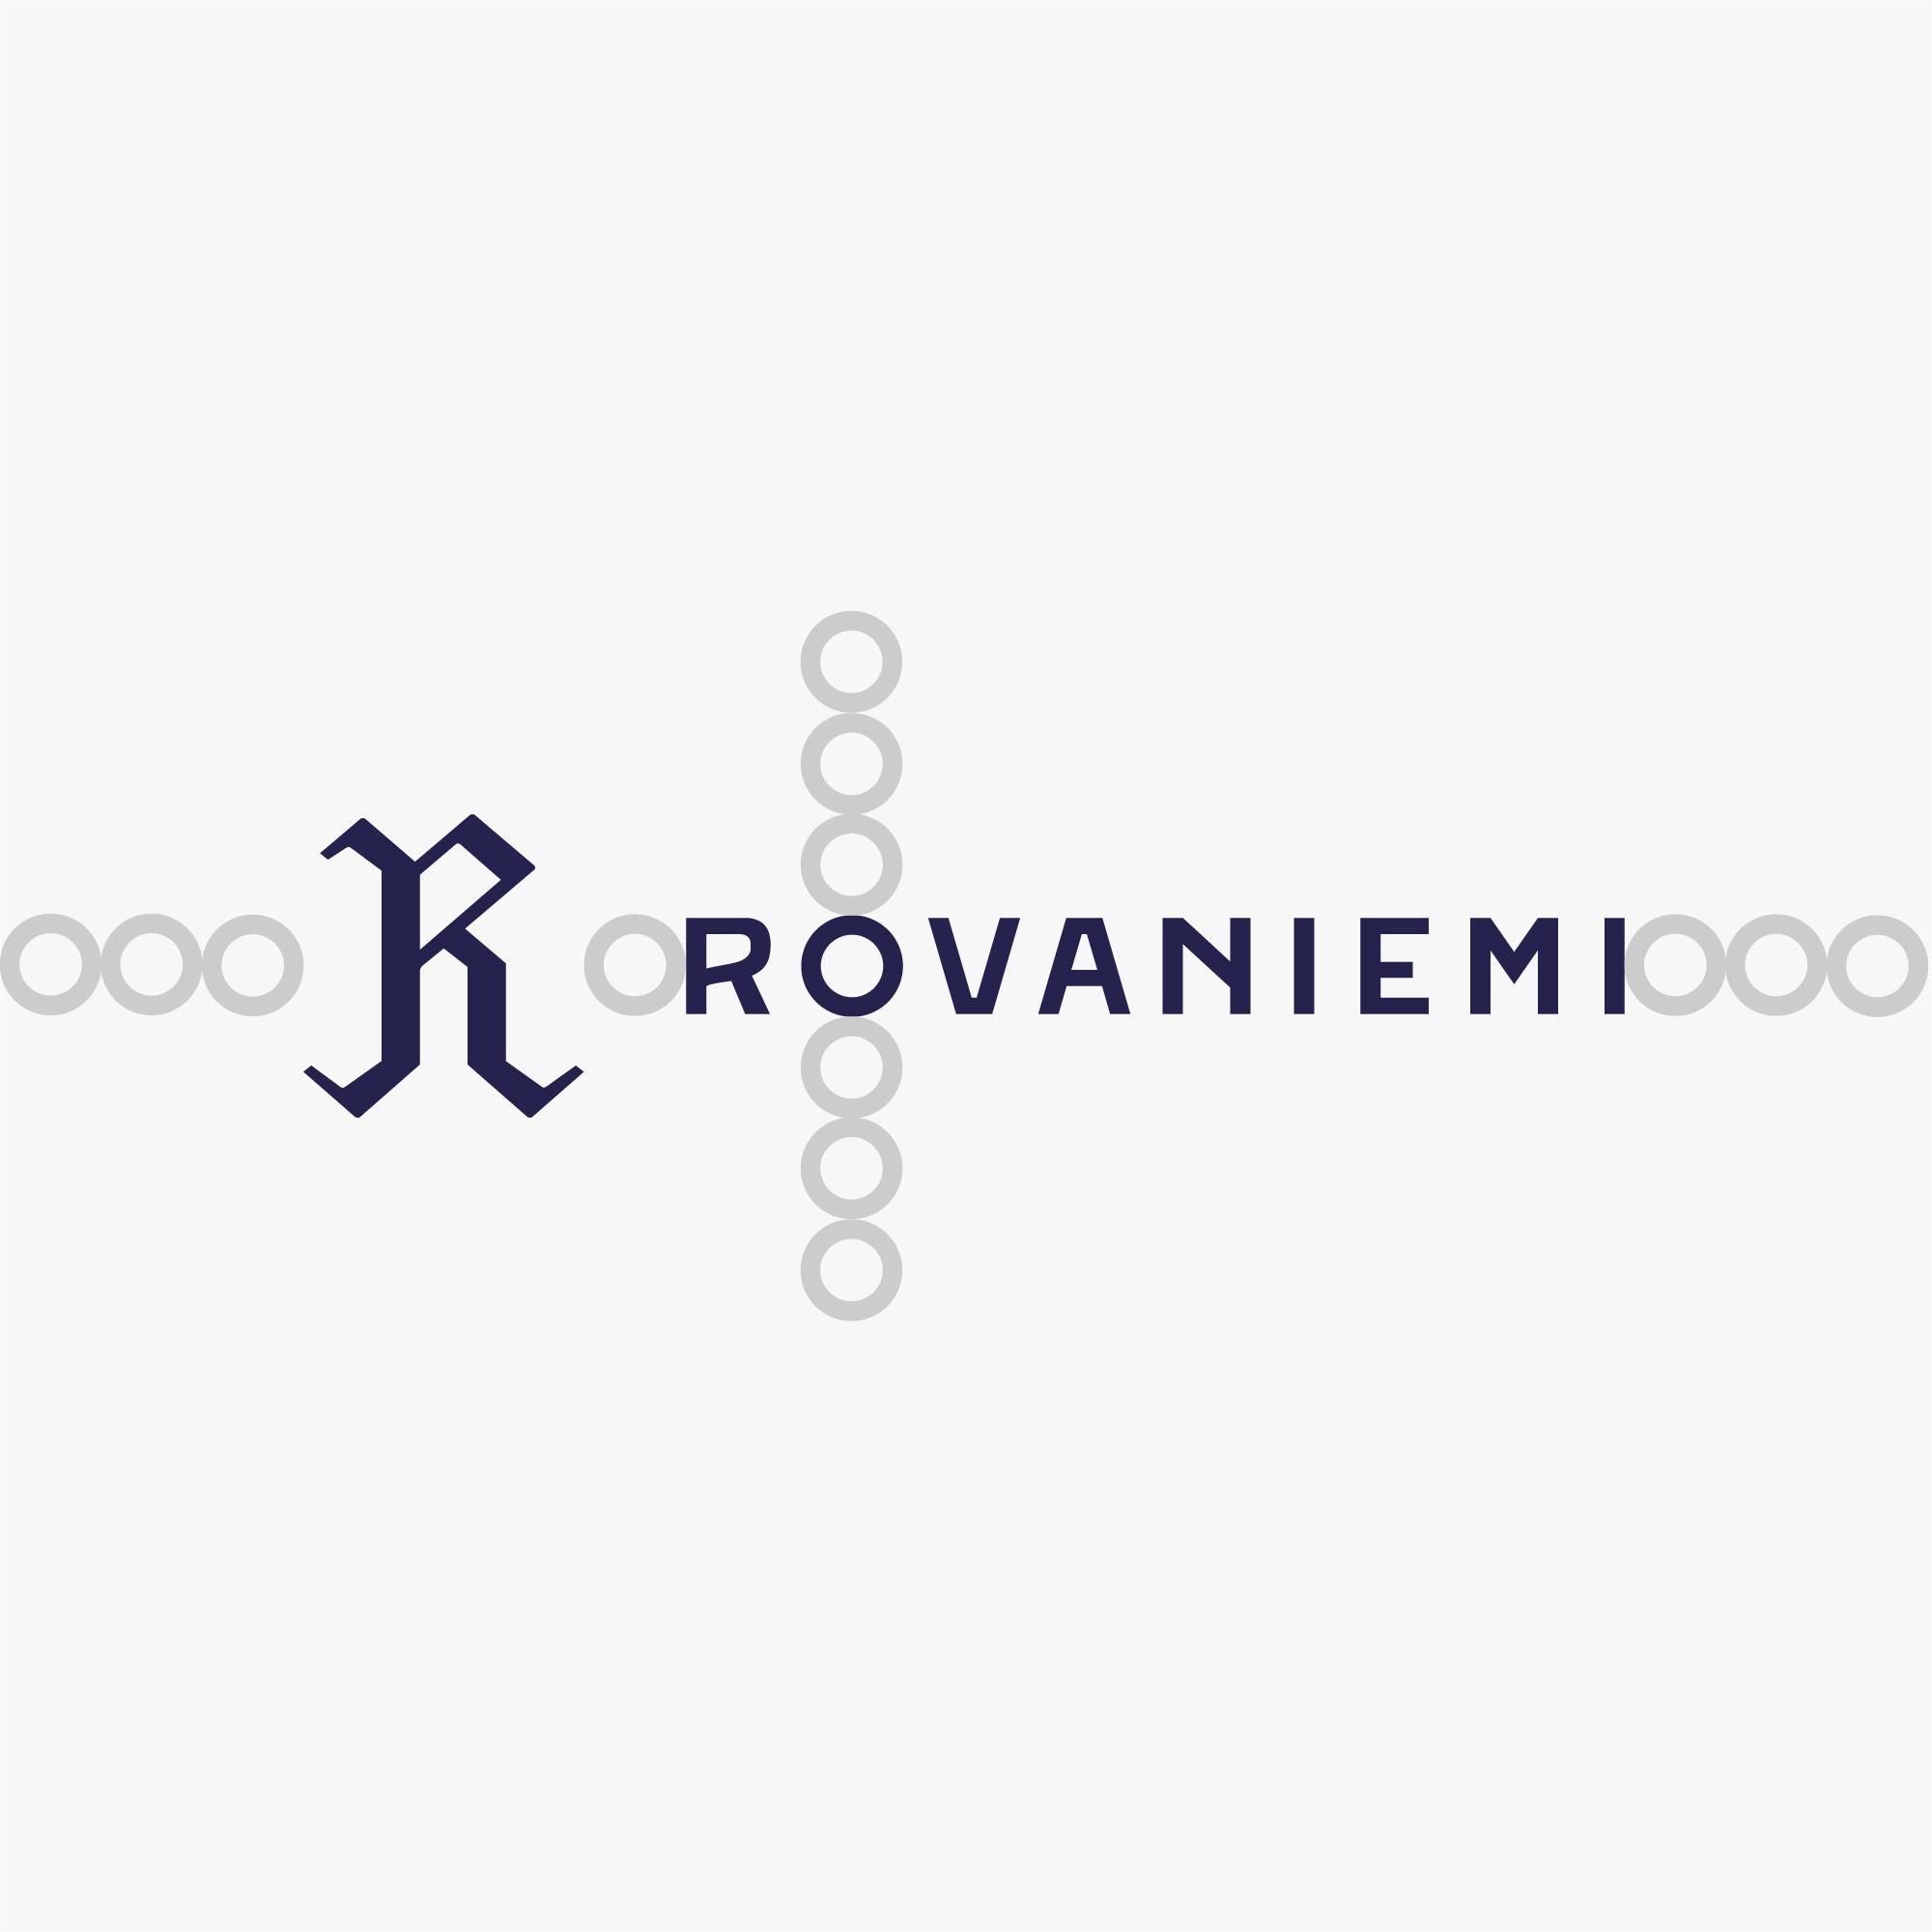 Rovaniemi-logo-vaakana-suoja-alue